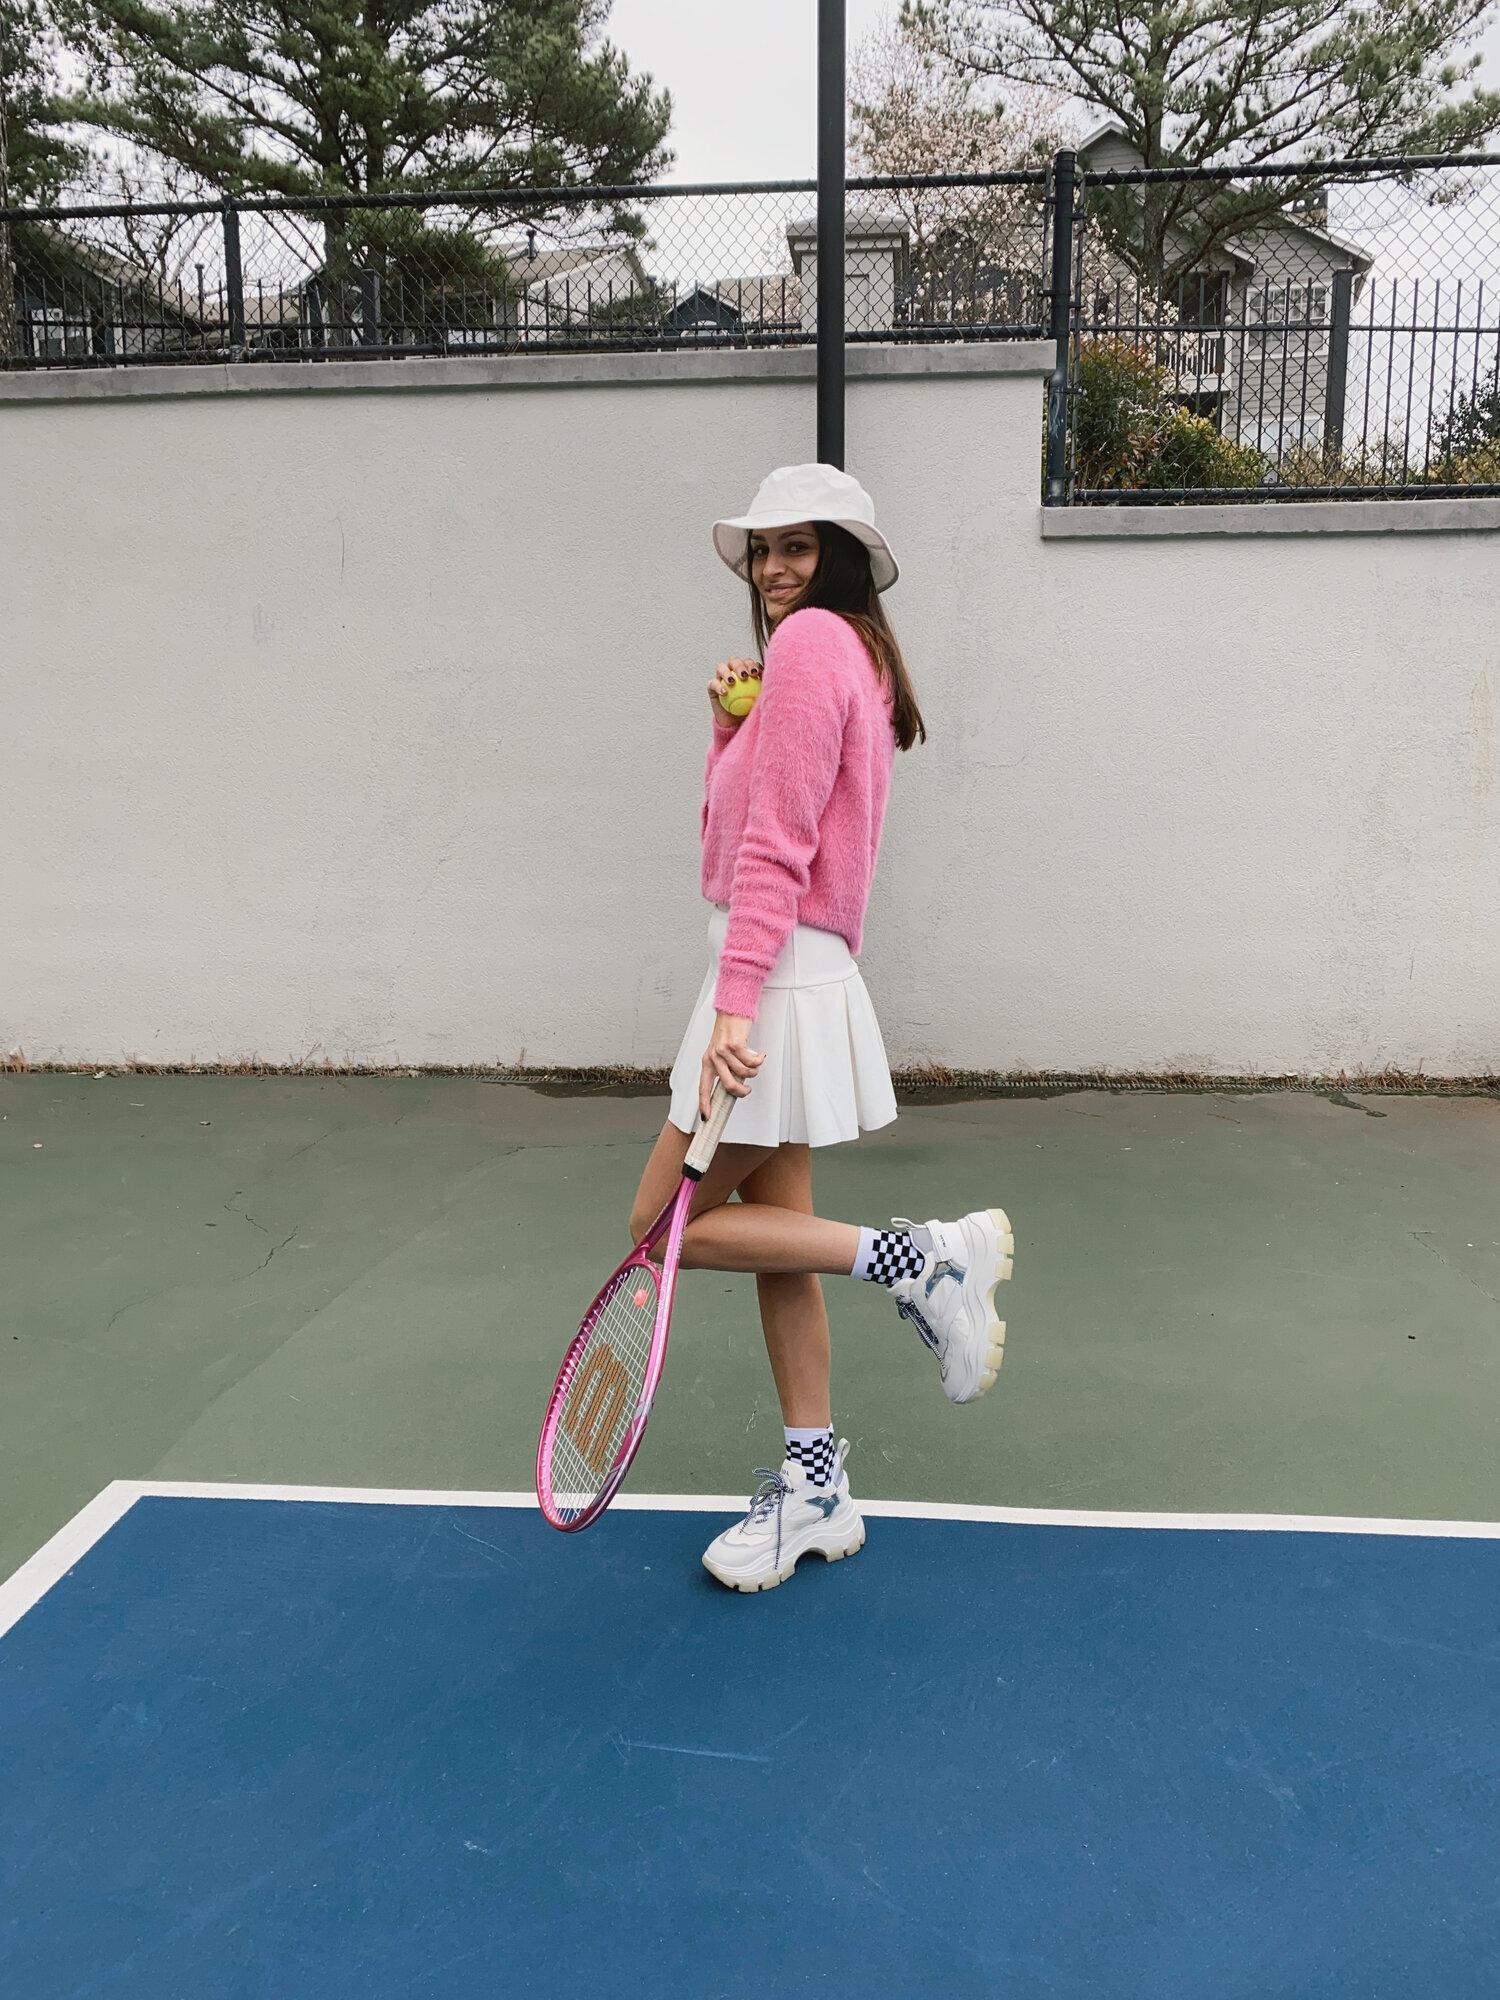 Sporty Chic Cute Tennis Outfits Anna Elizabeth